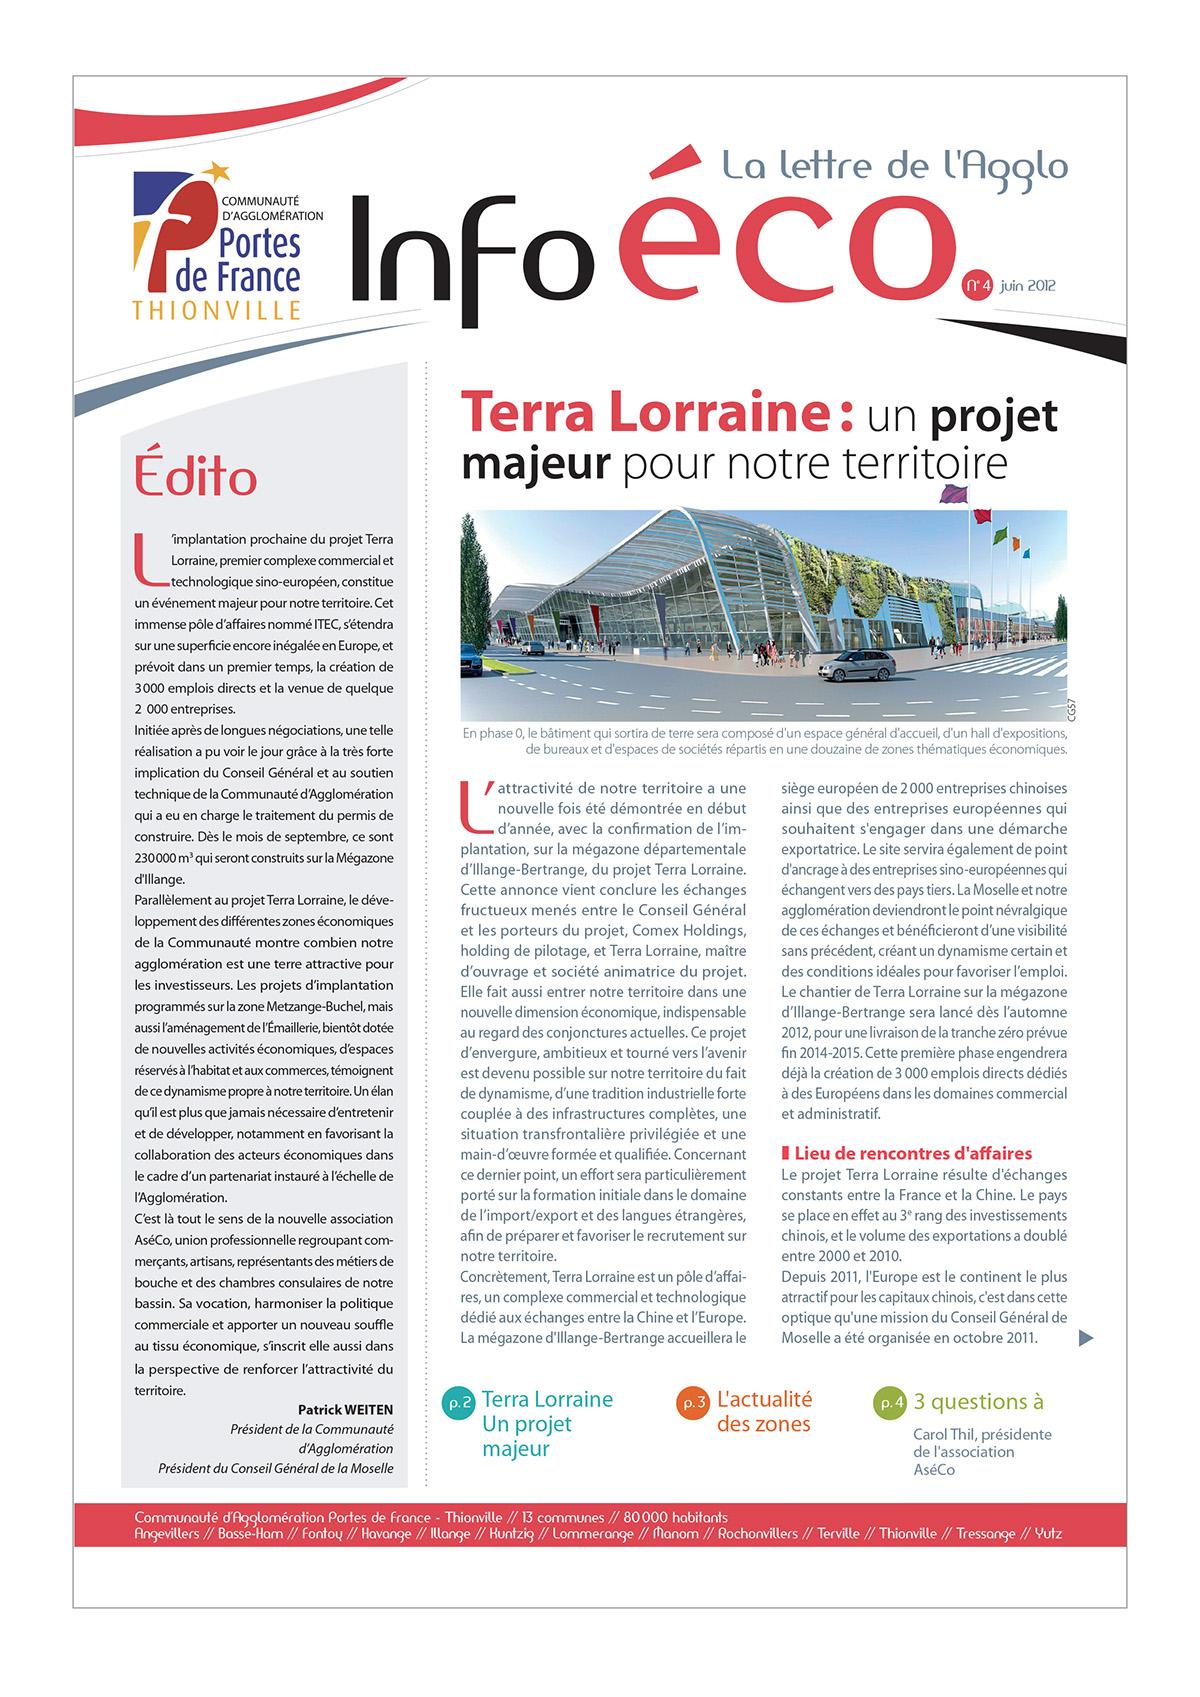 éliane Panchetti on Behance